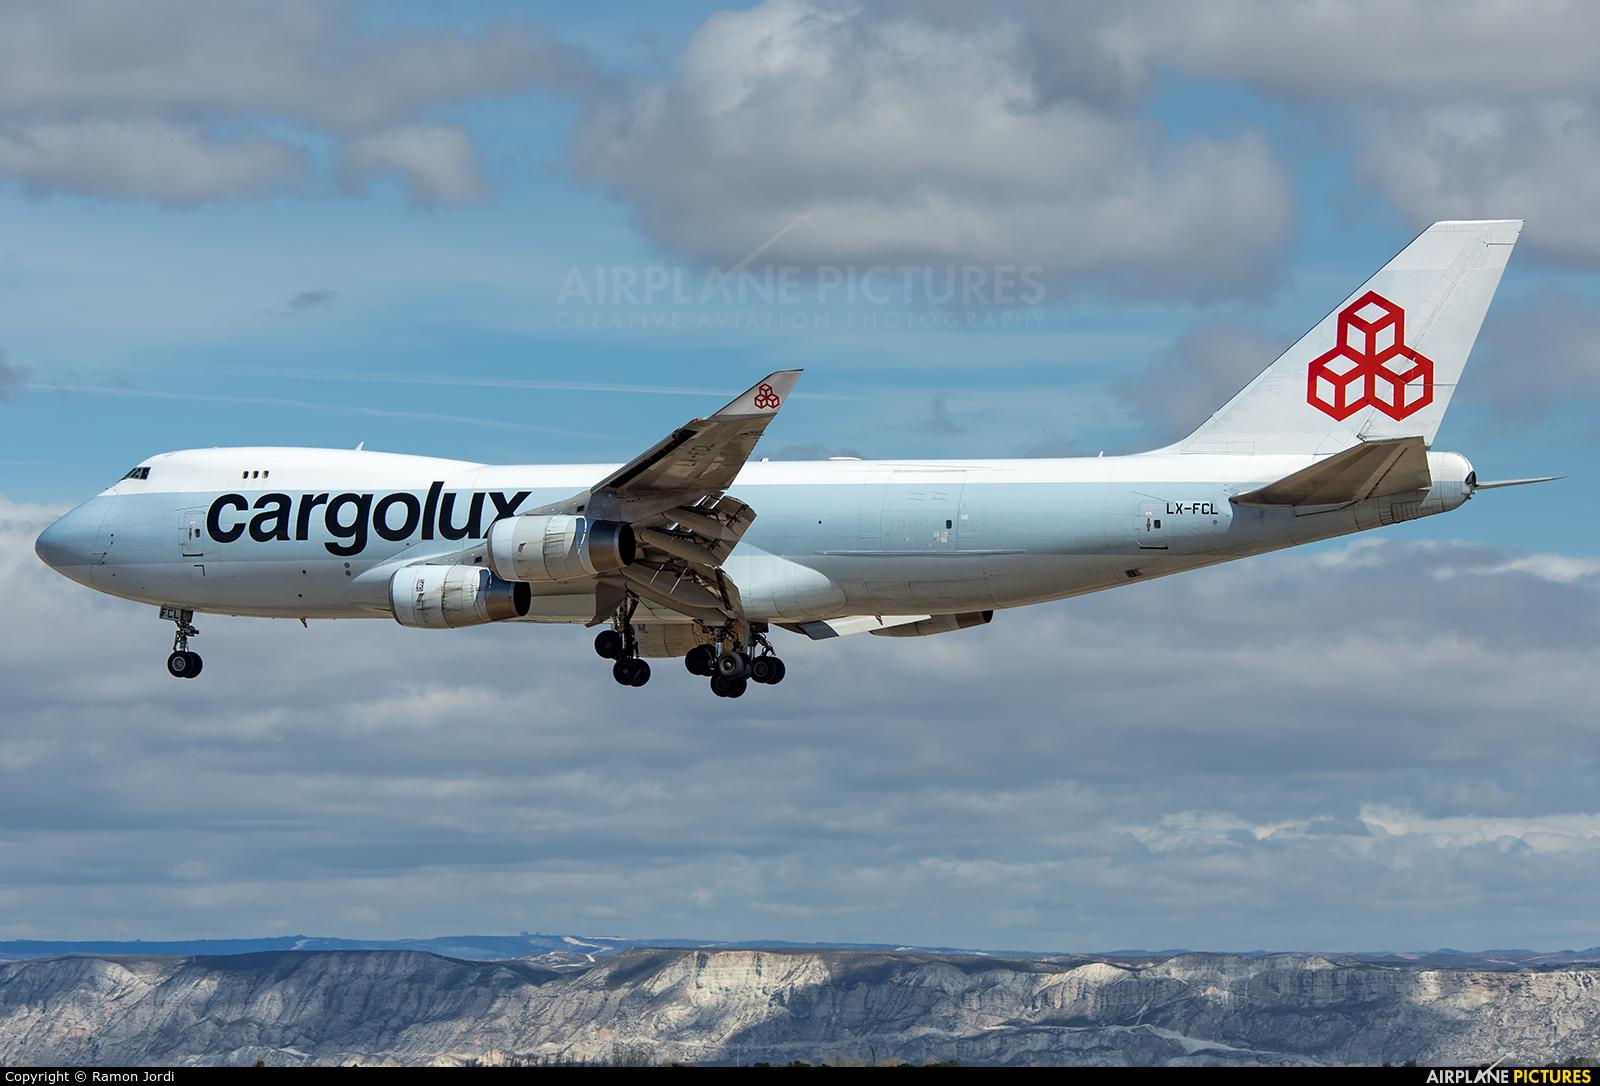 Cargolux LX-FCL aircraft at Zaragoza